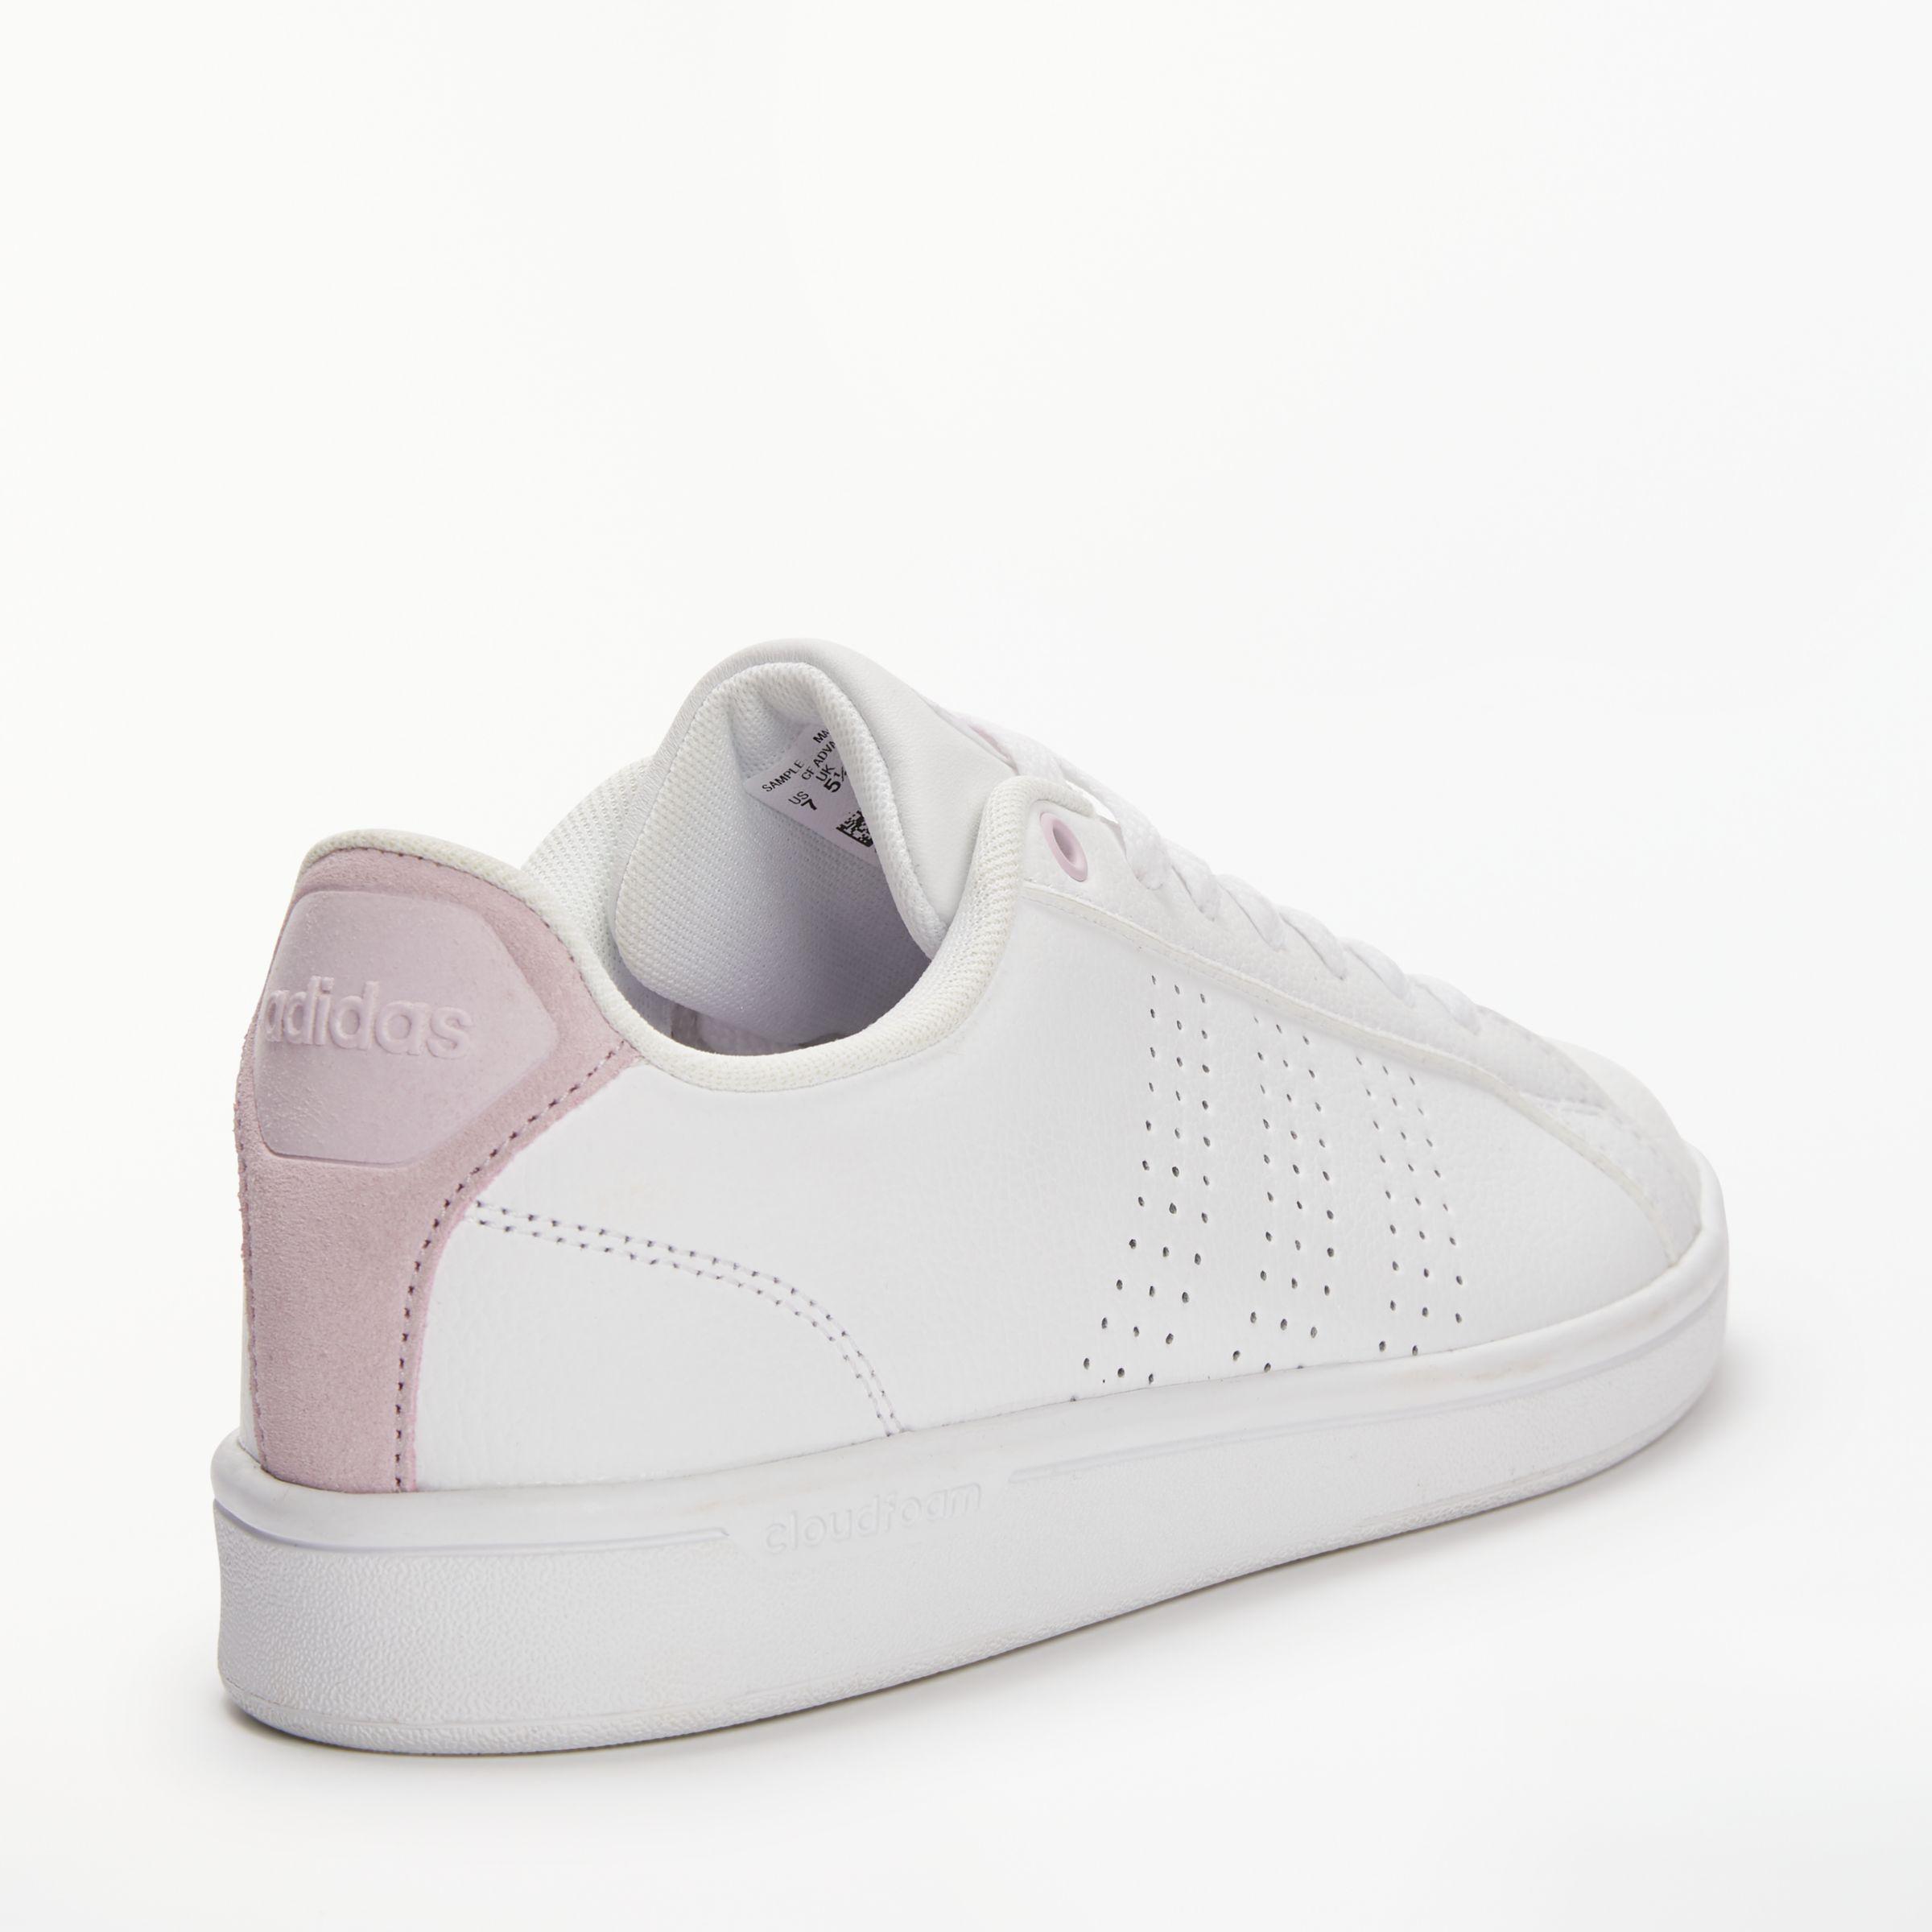 adidas neo cloudfoam advantage women's trainers cheap online